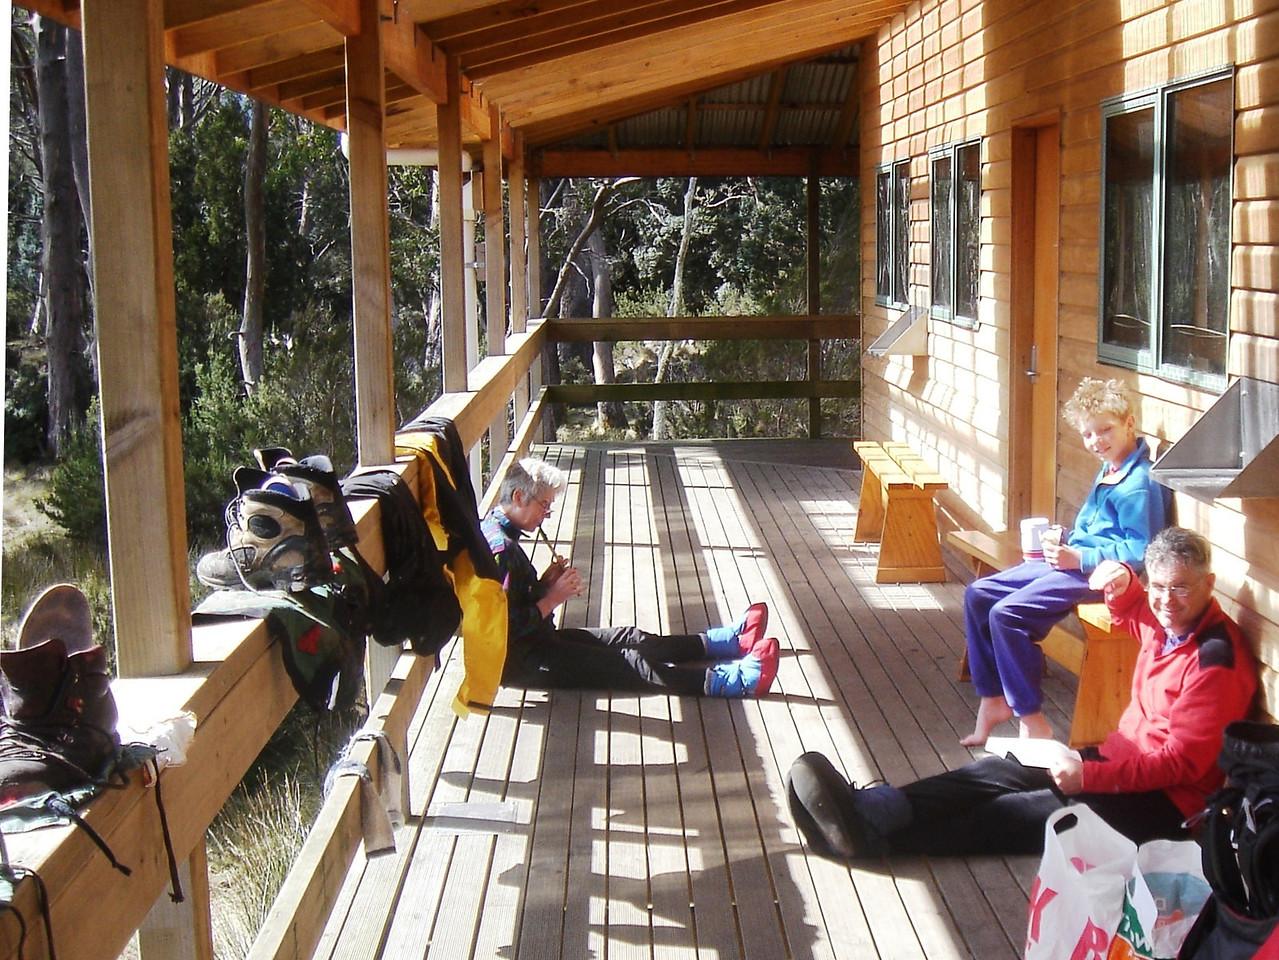 Kicking back at Pelion Hut